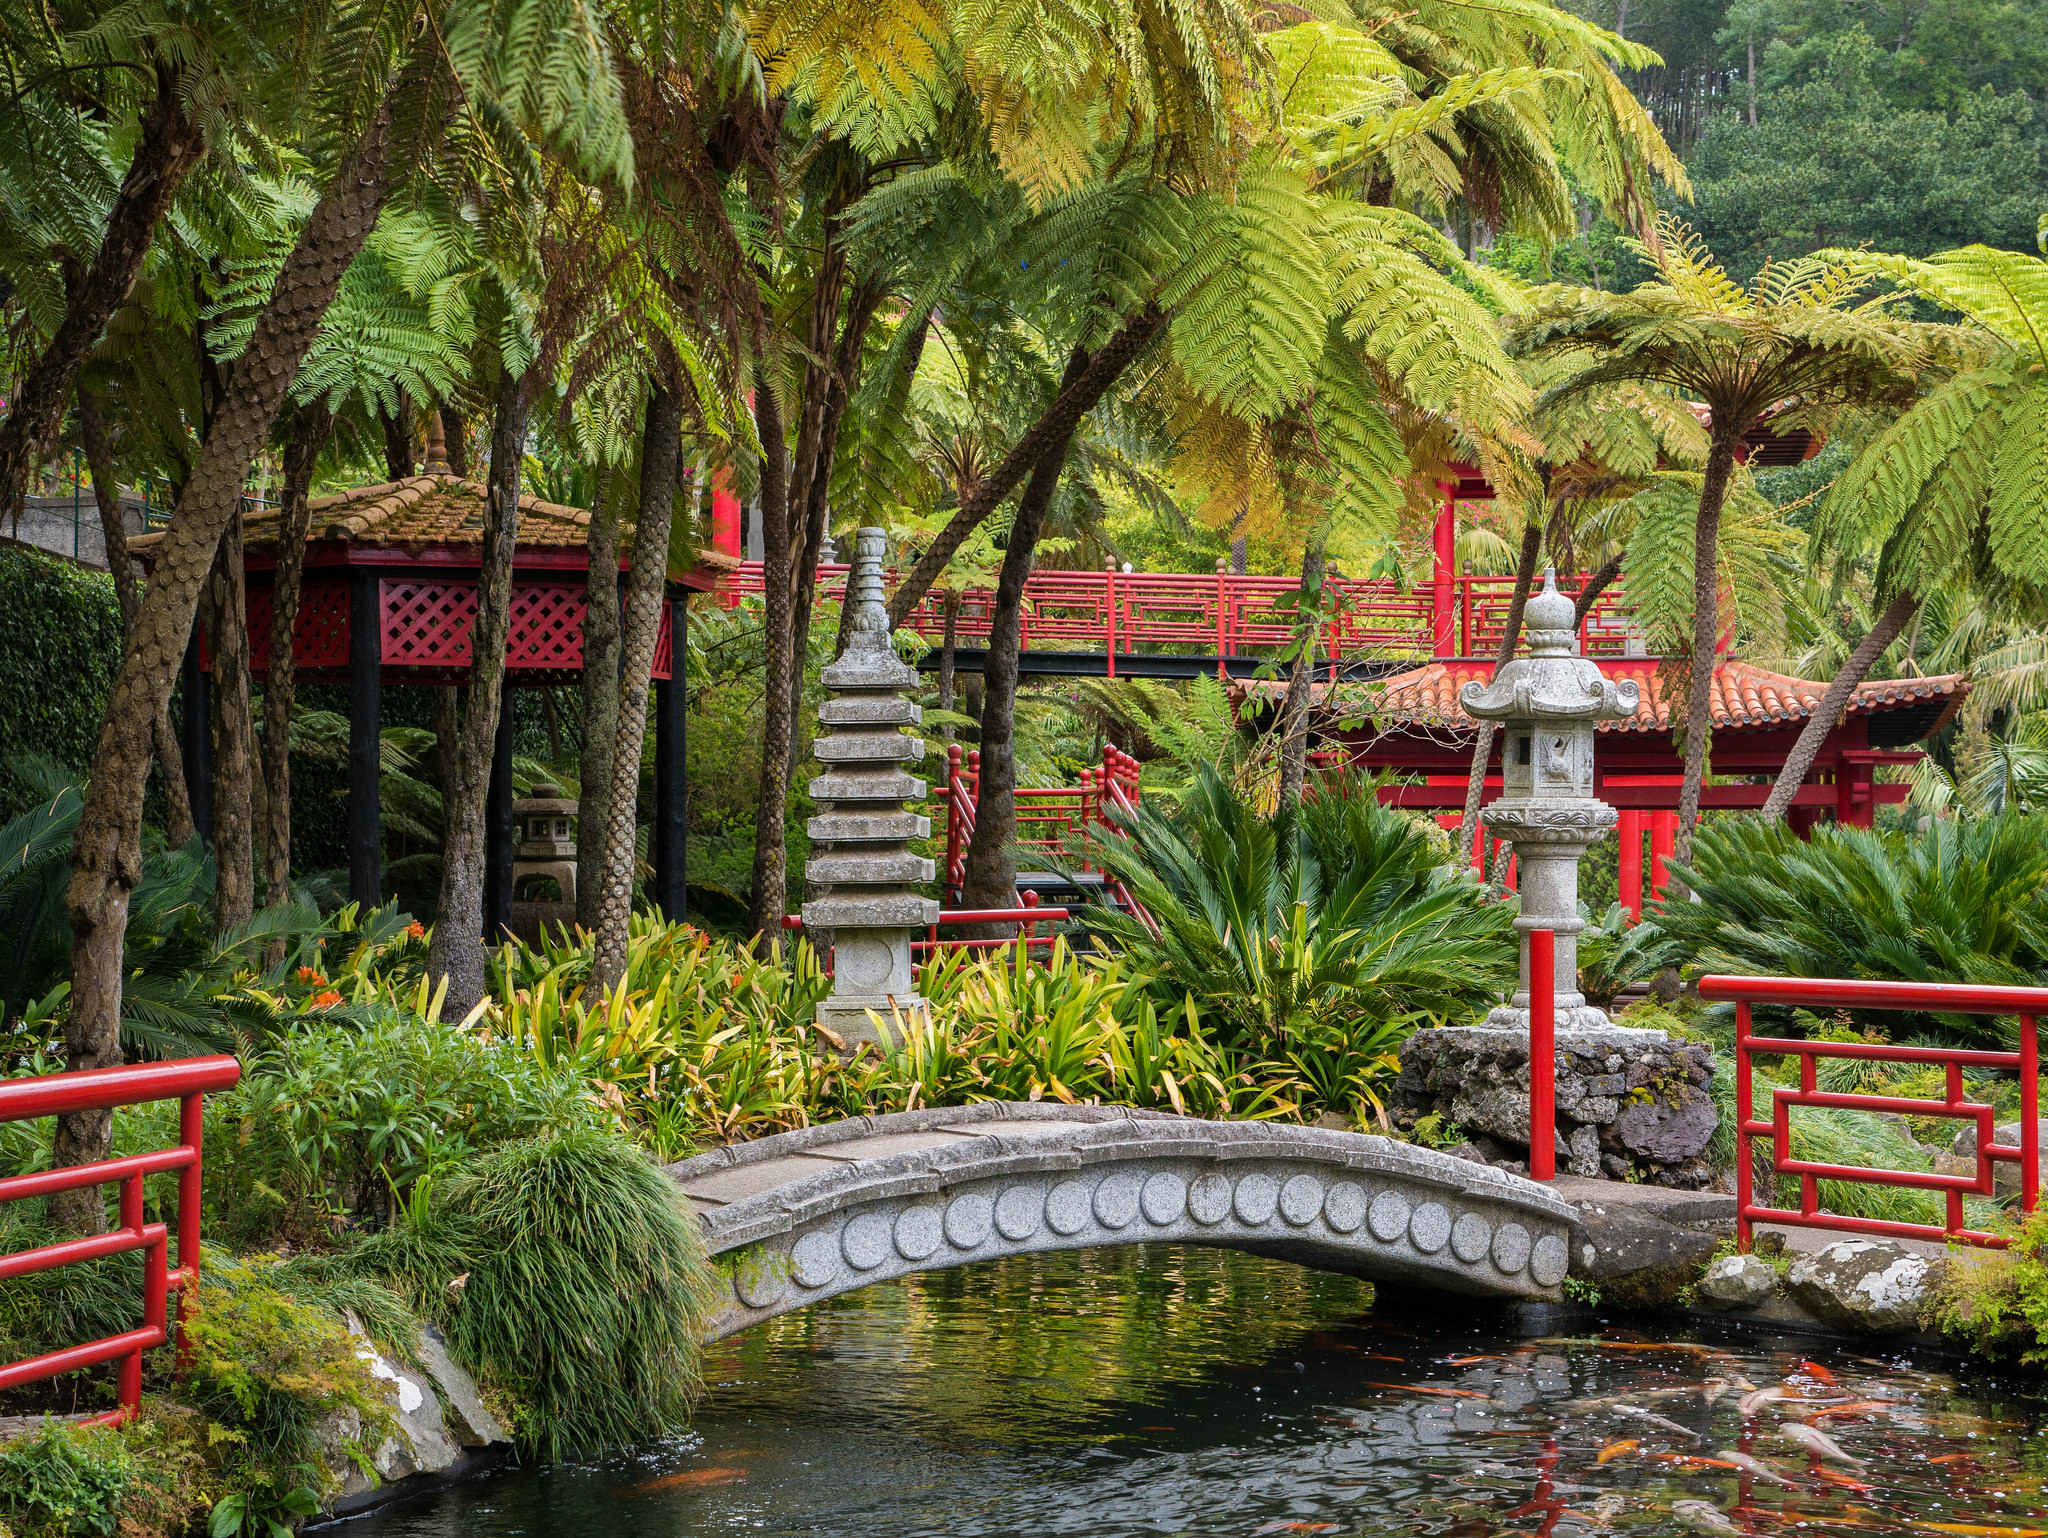 24+ Tropical Garden Designs, Decorating Ideas | Design ... on Tropical Backyard Ideas  id=75483